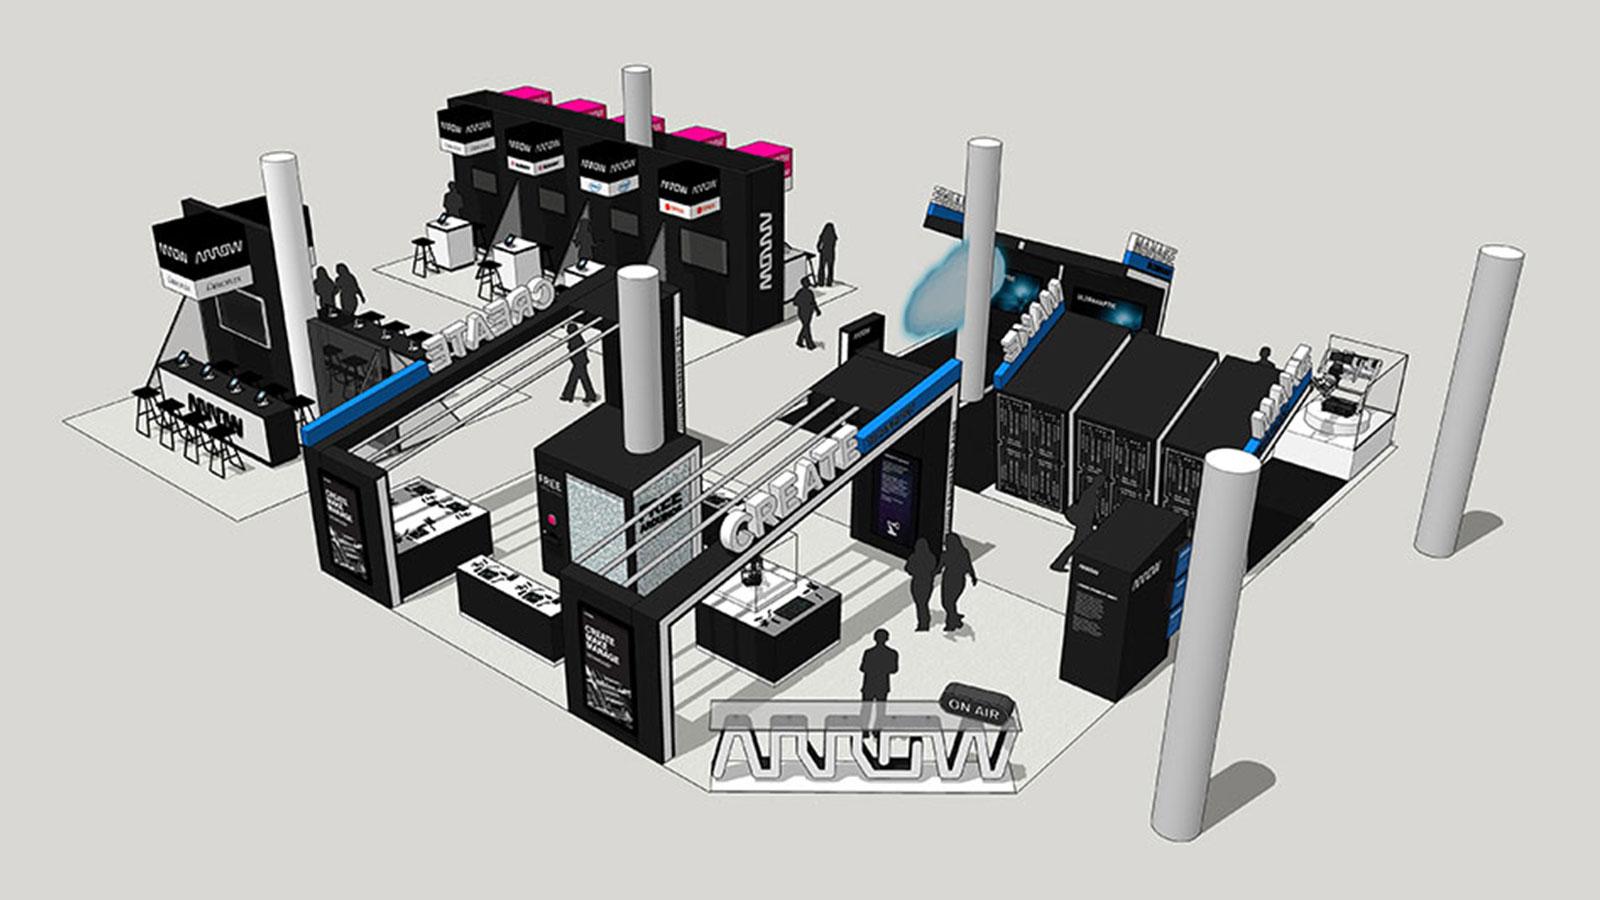 Arrow CES 2019 stand design concept